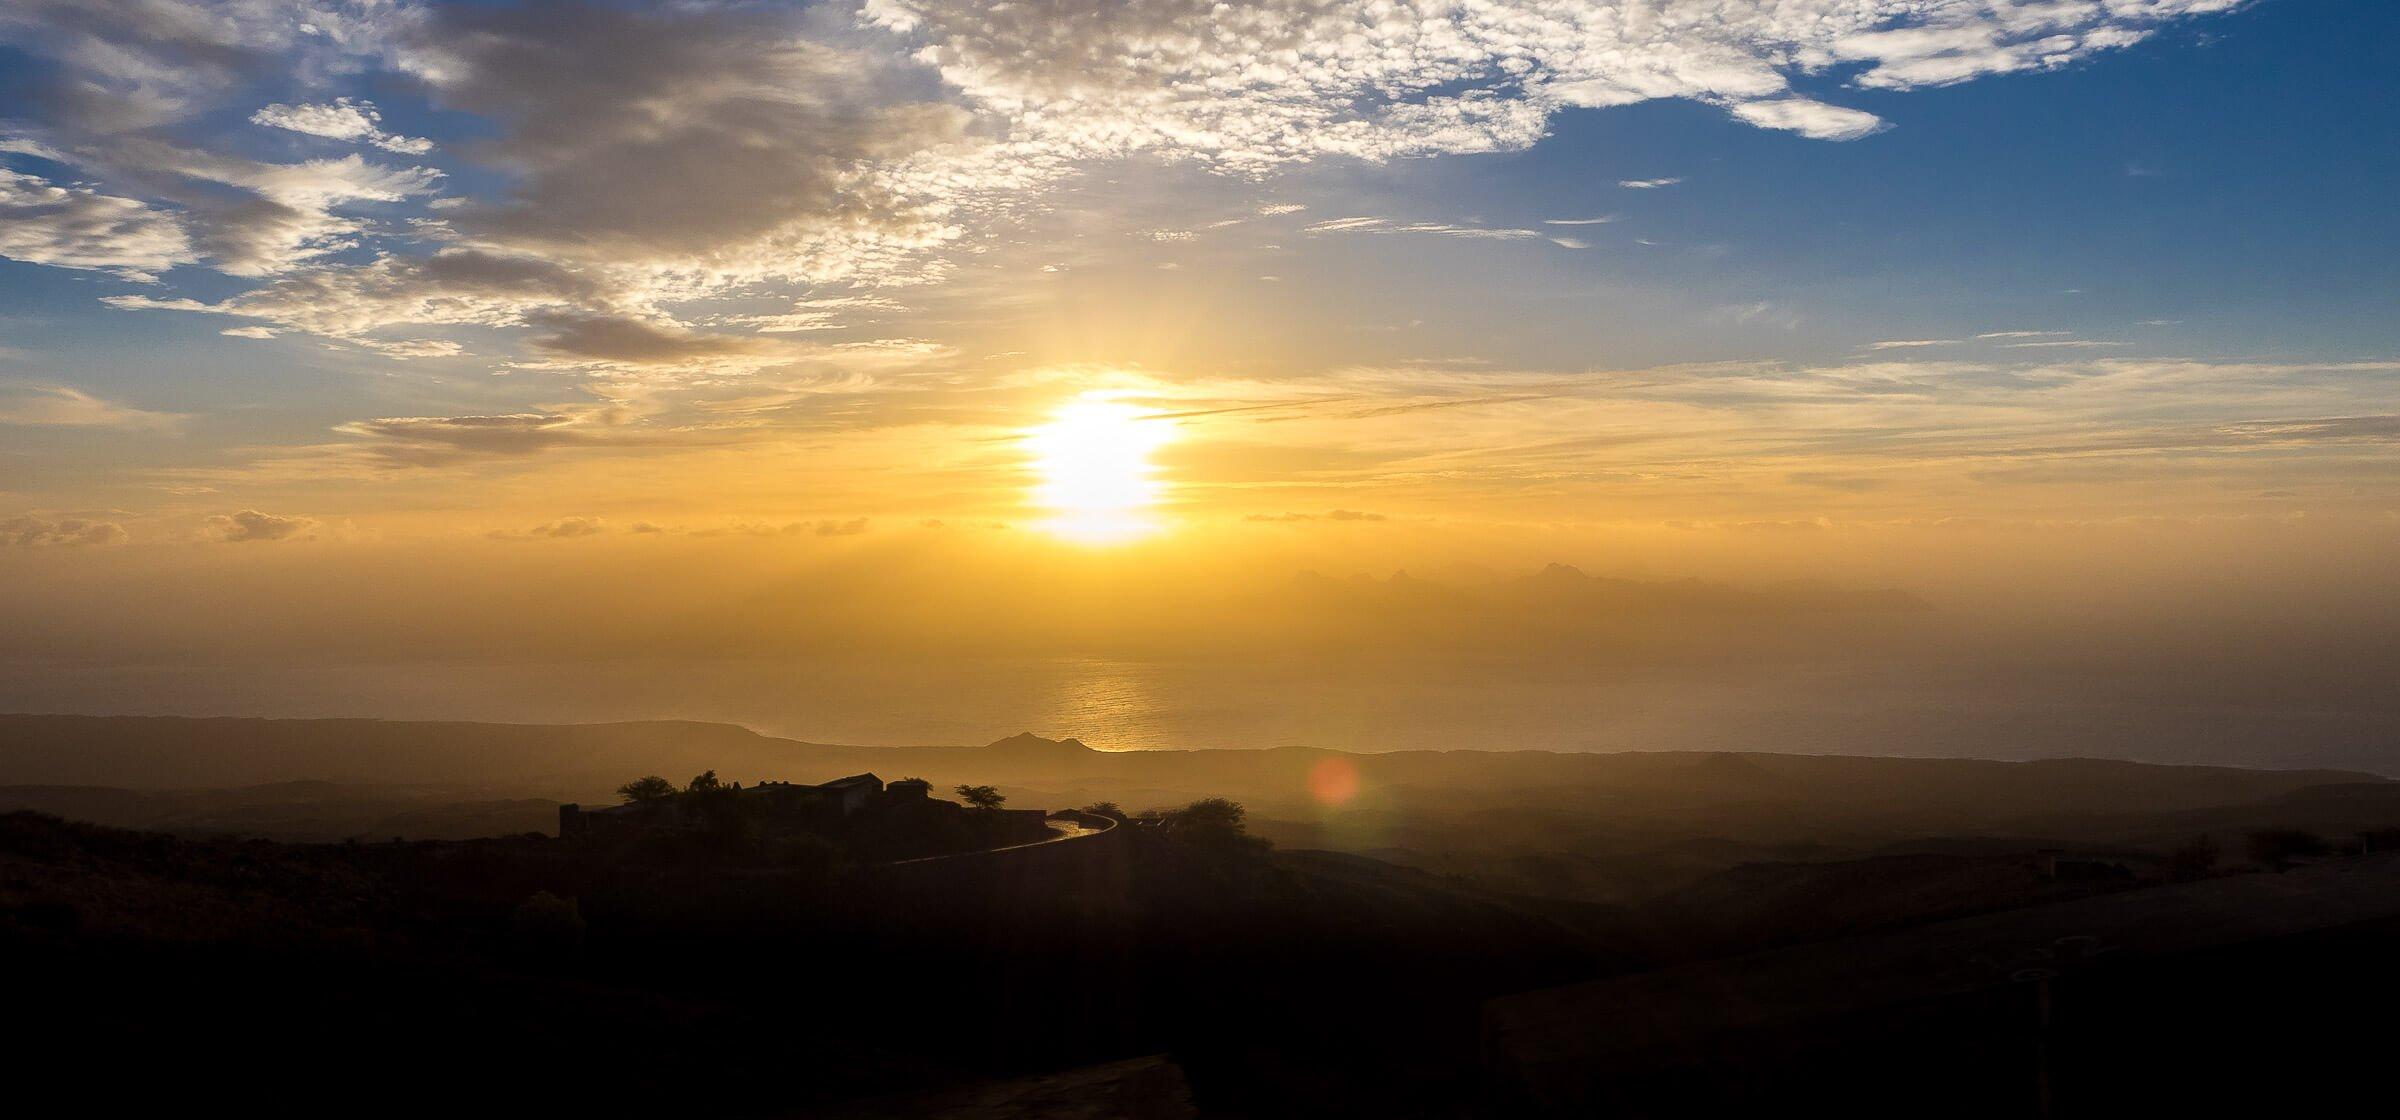 Sunrise on Sao Vicente Island, Cape Verde